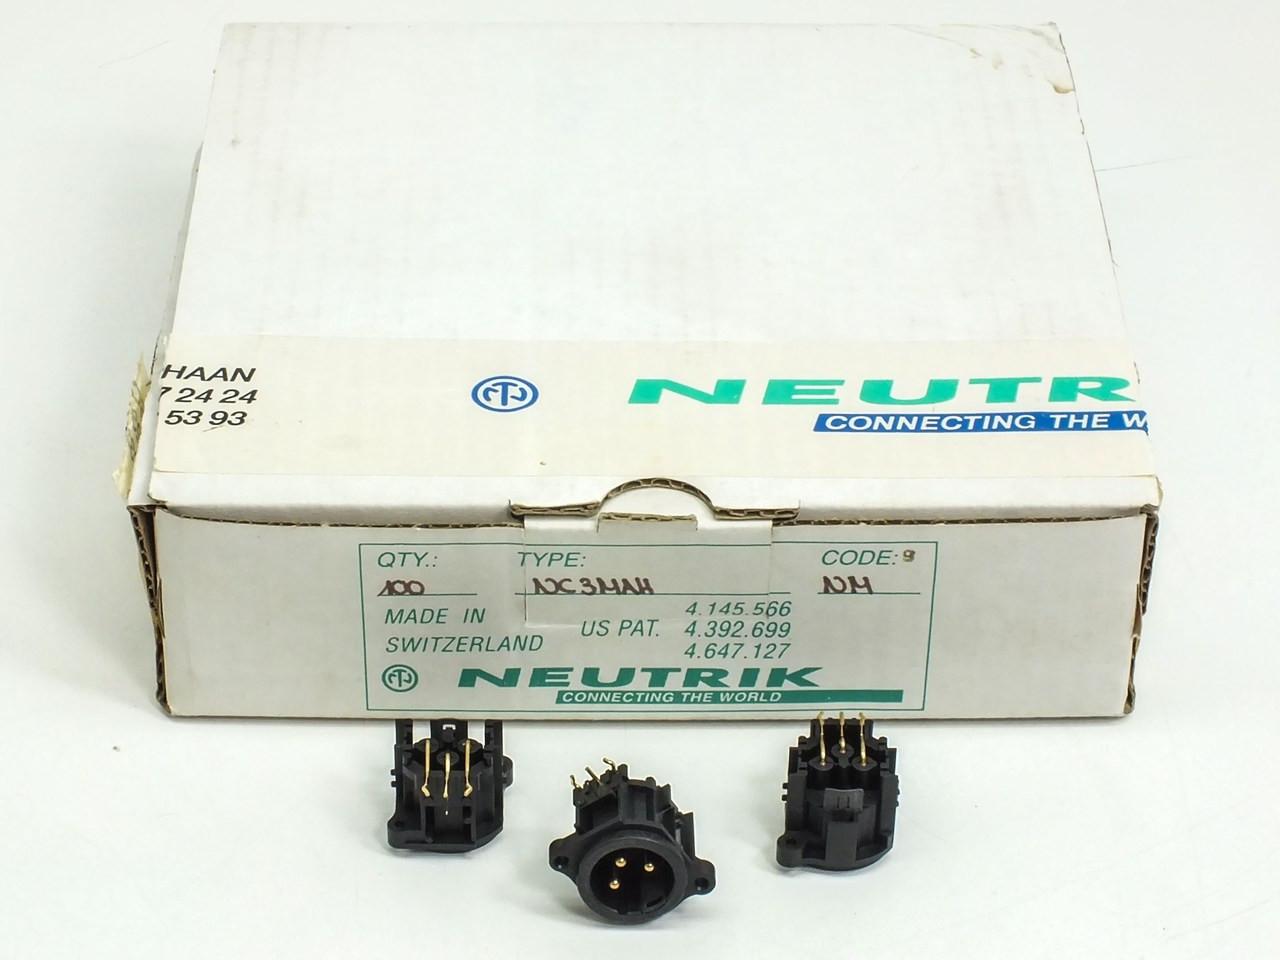 neutrik nc3mah 3 pole male xlr receptacle plastic housing box of 100  [ 1280 x 960 Pixel ]